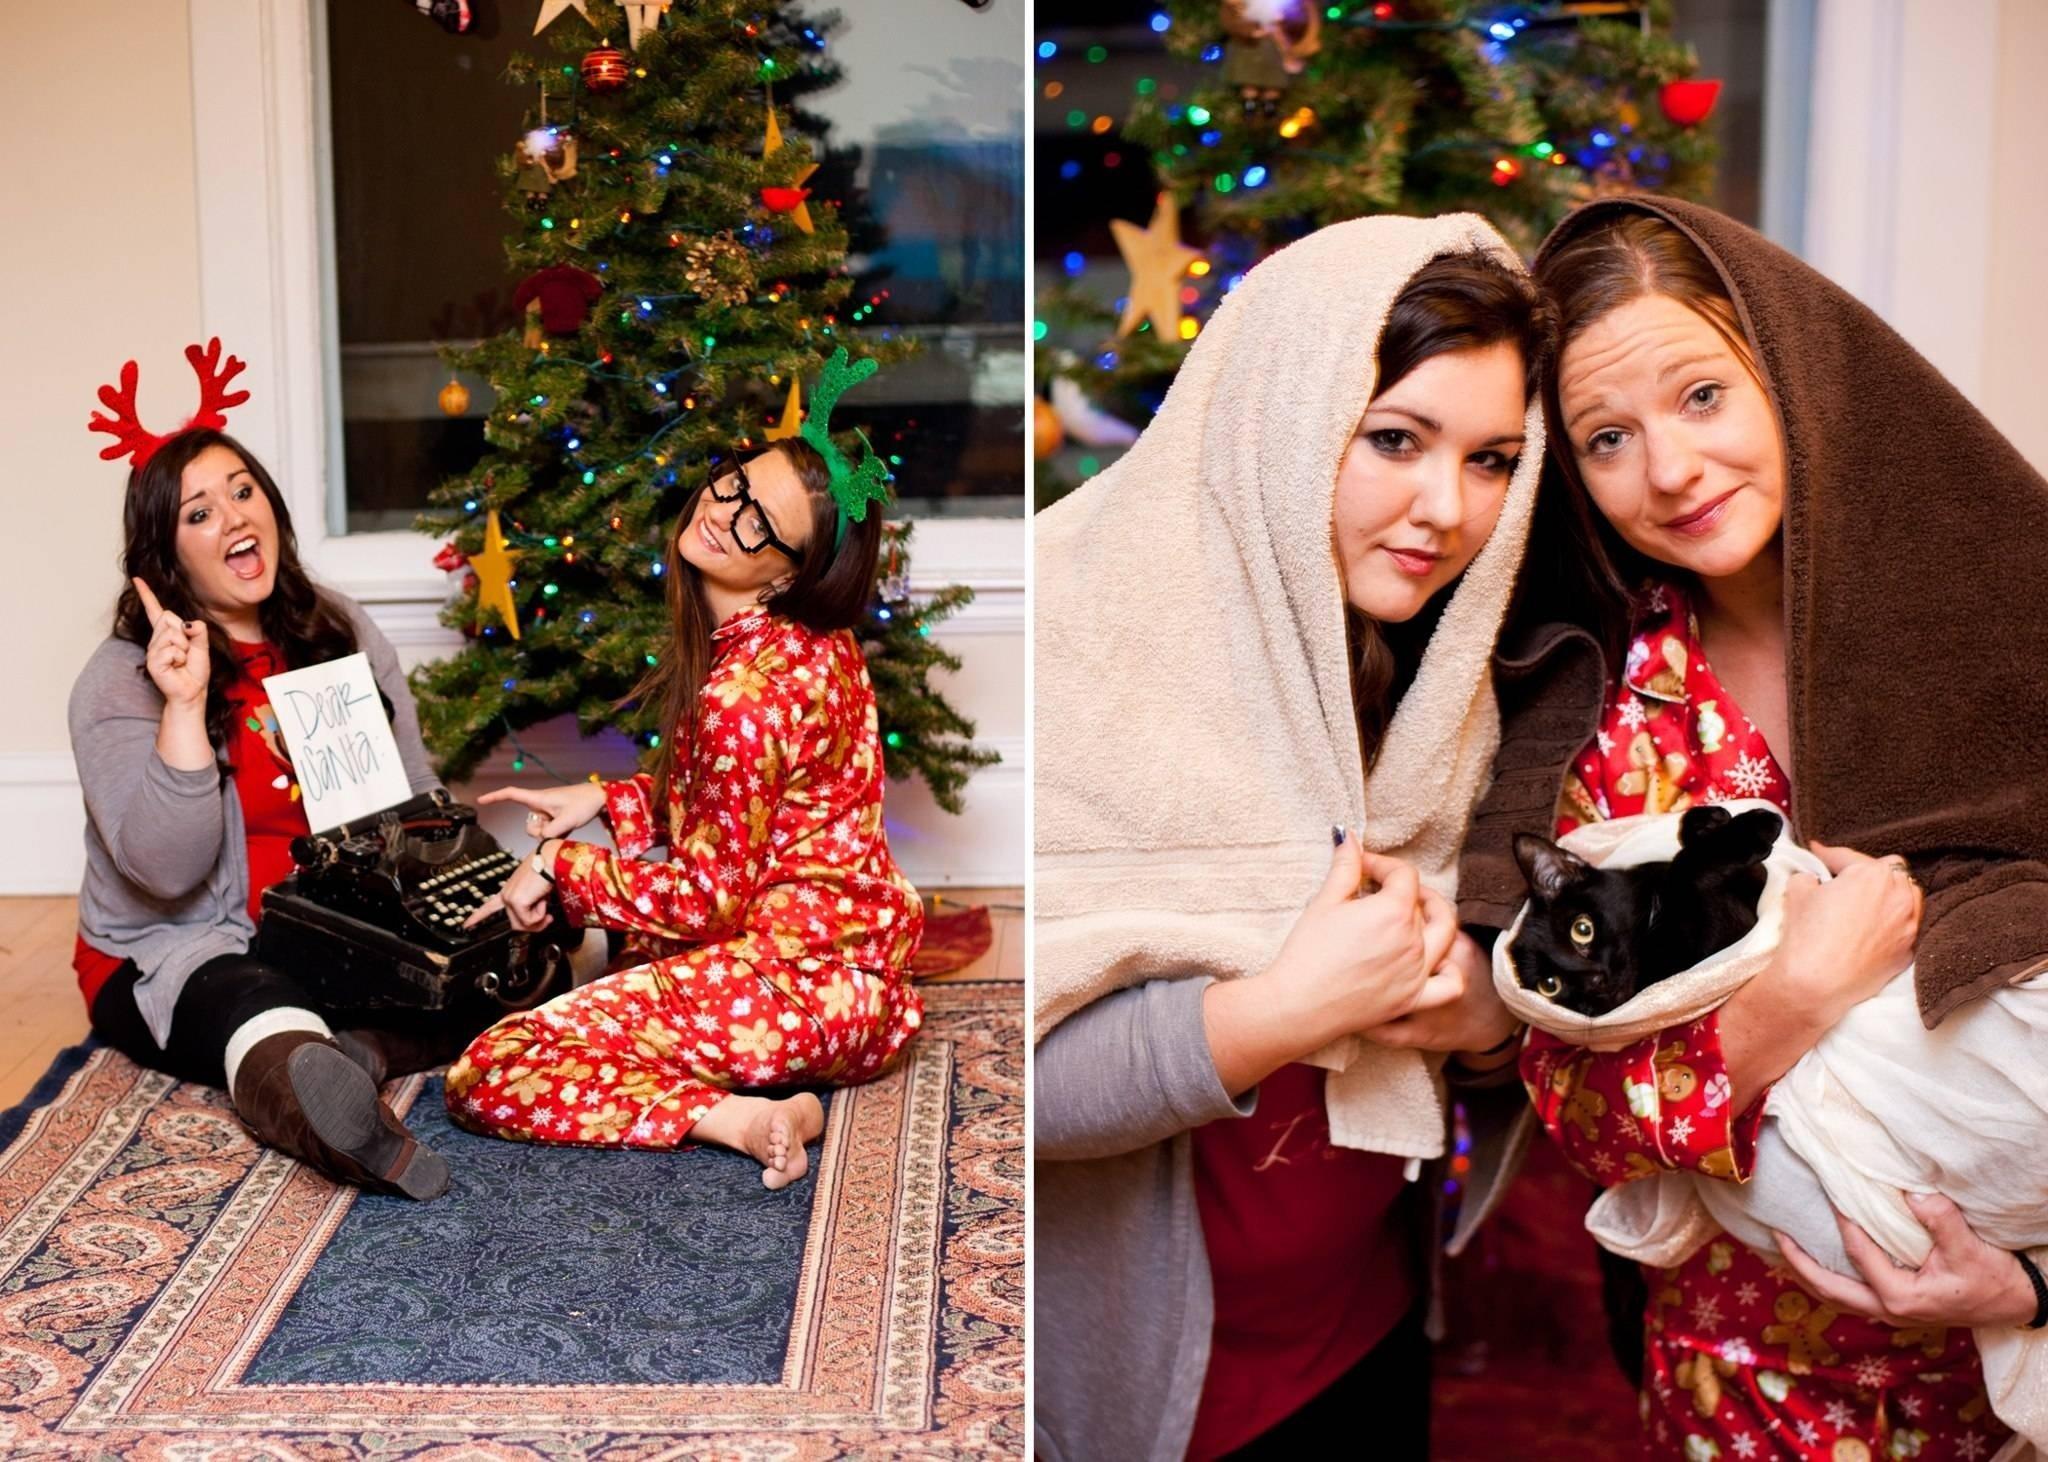 10 Unique Christmas Family Photo Ideas Funny funny homemade christmas cards huffington post tierra este 17145 12